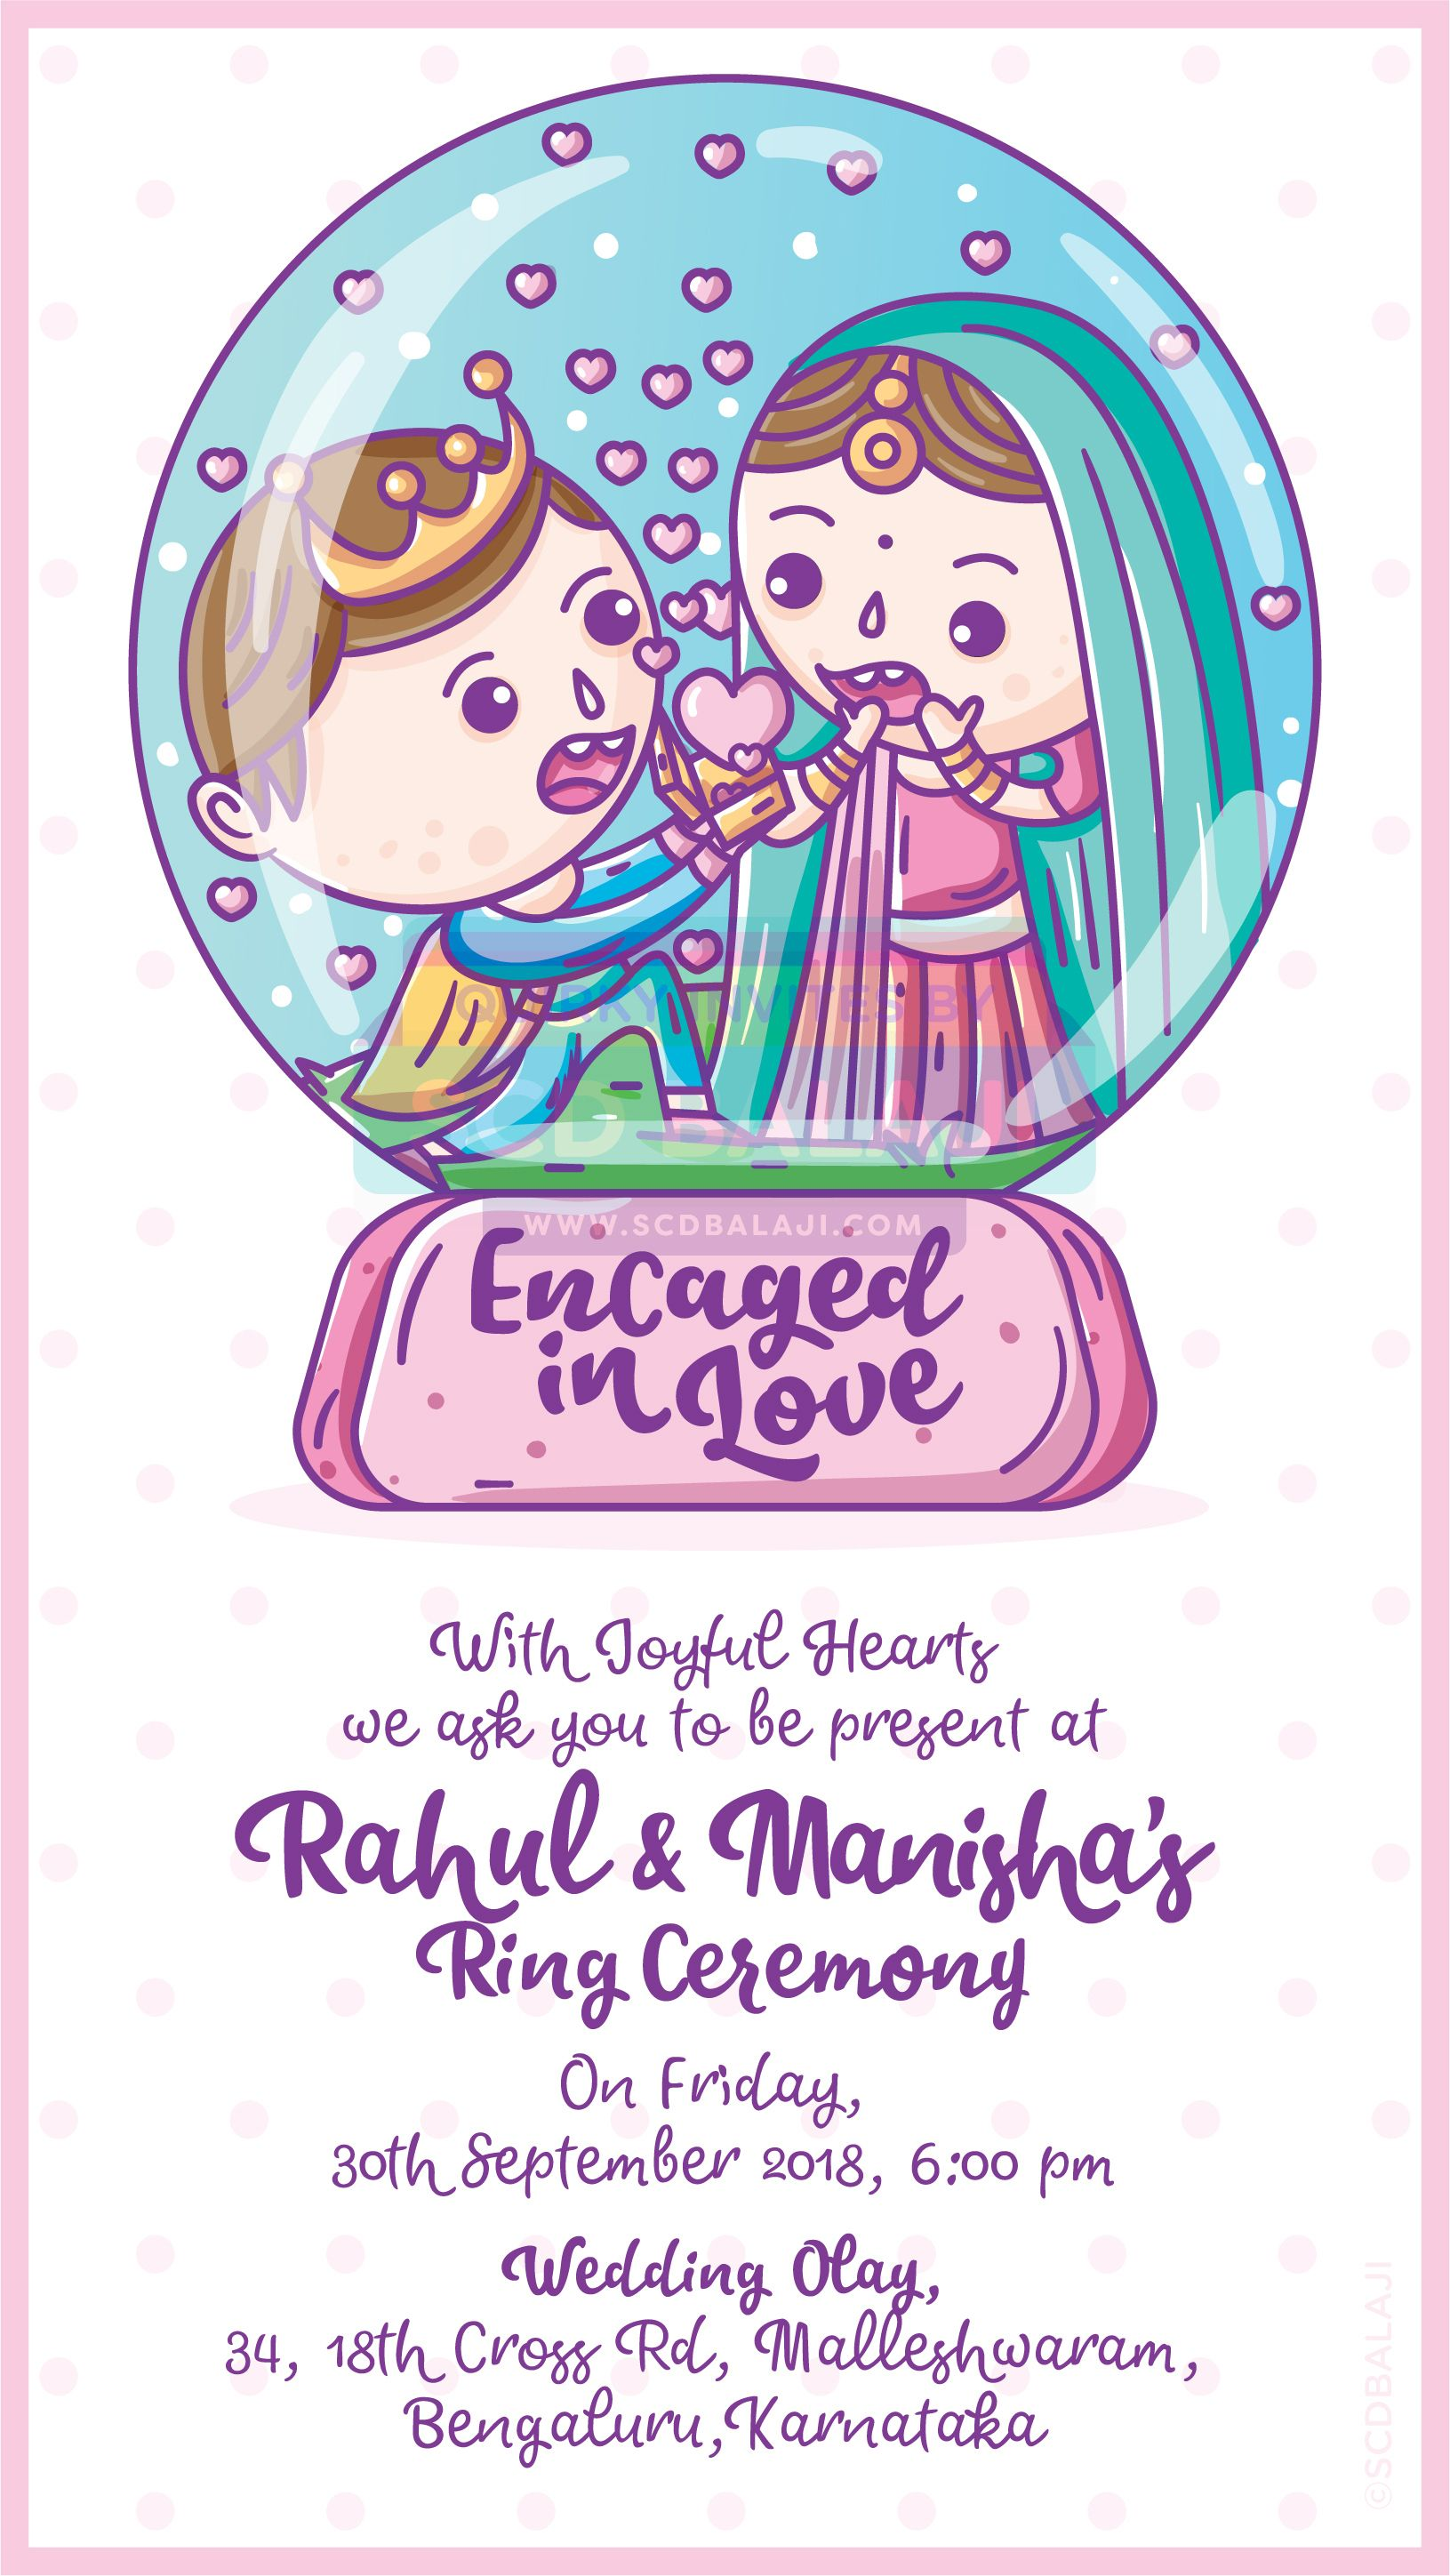 Indian Wedding Engagement (Ring Ceremony) einvitation / einvite ...